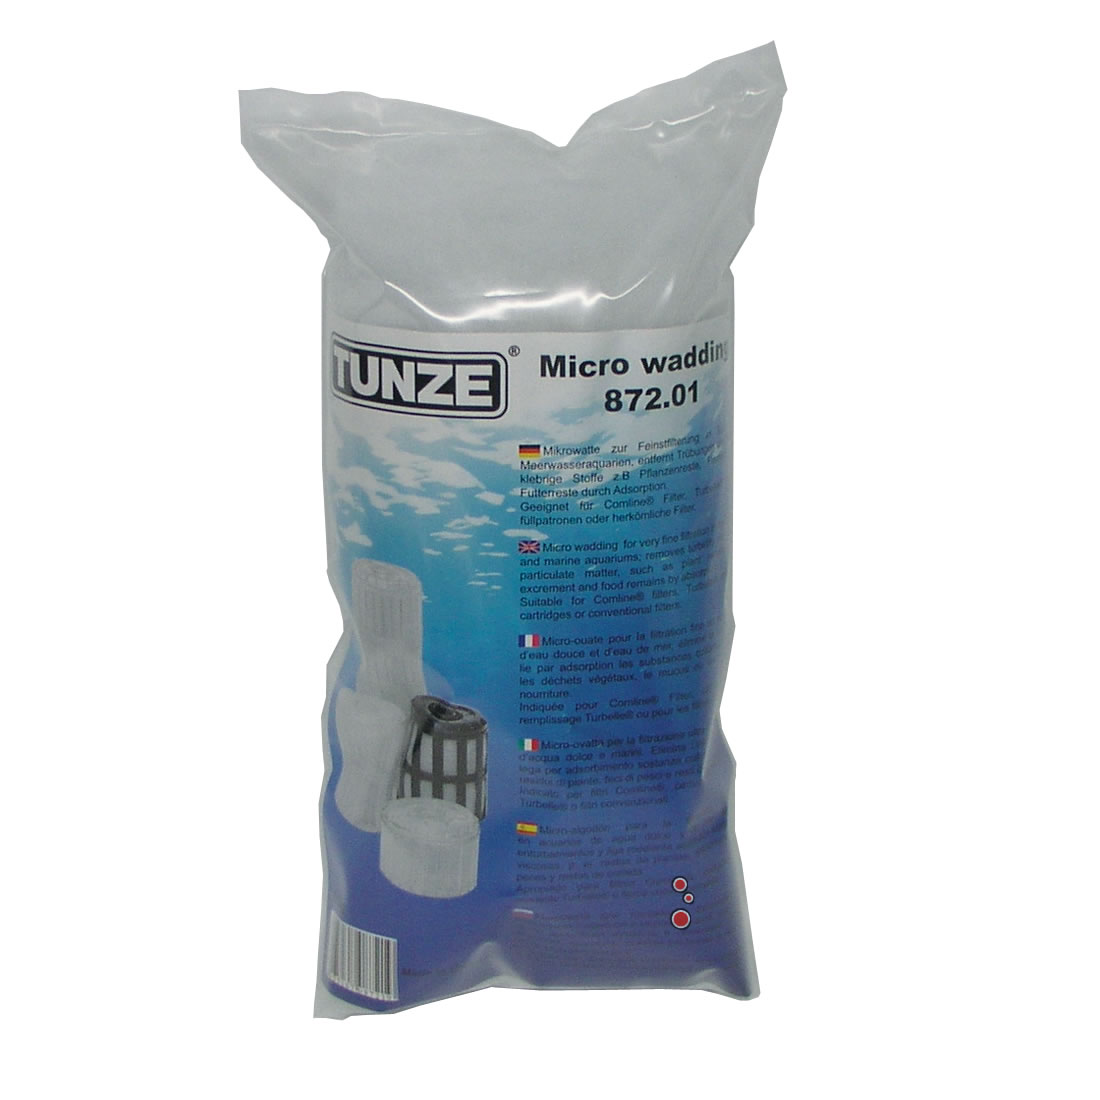 TUNZE Micro Wadding